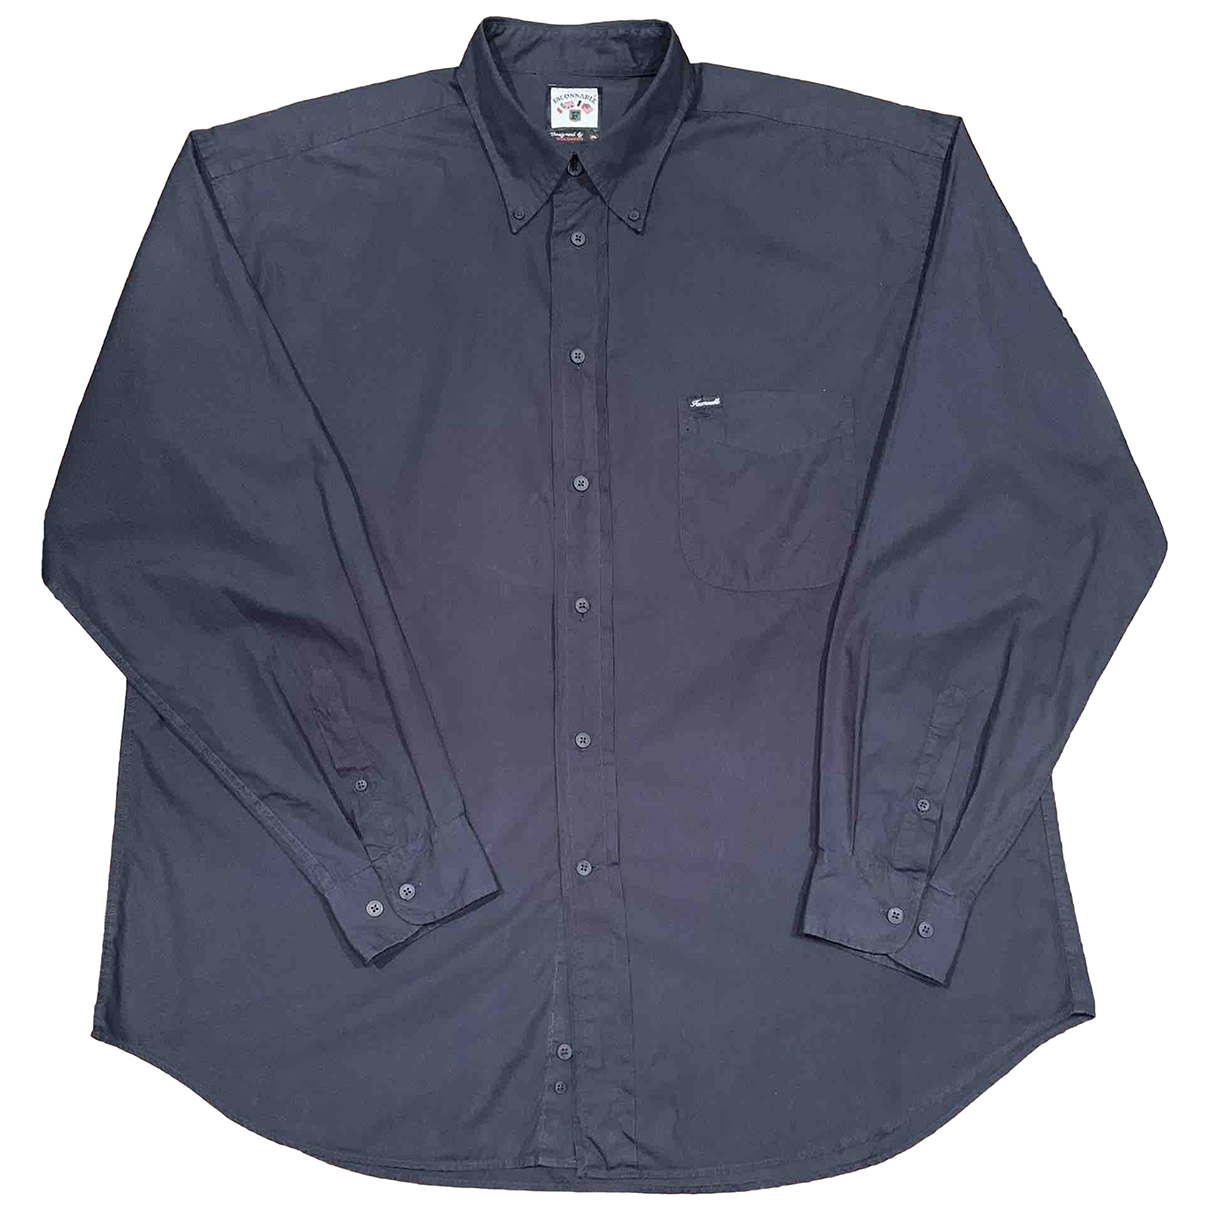 Faconnable \N Hemden in  Blau Baumwolle